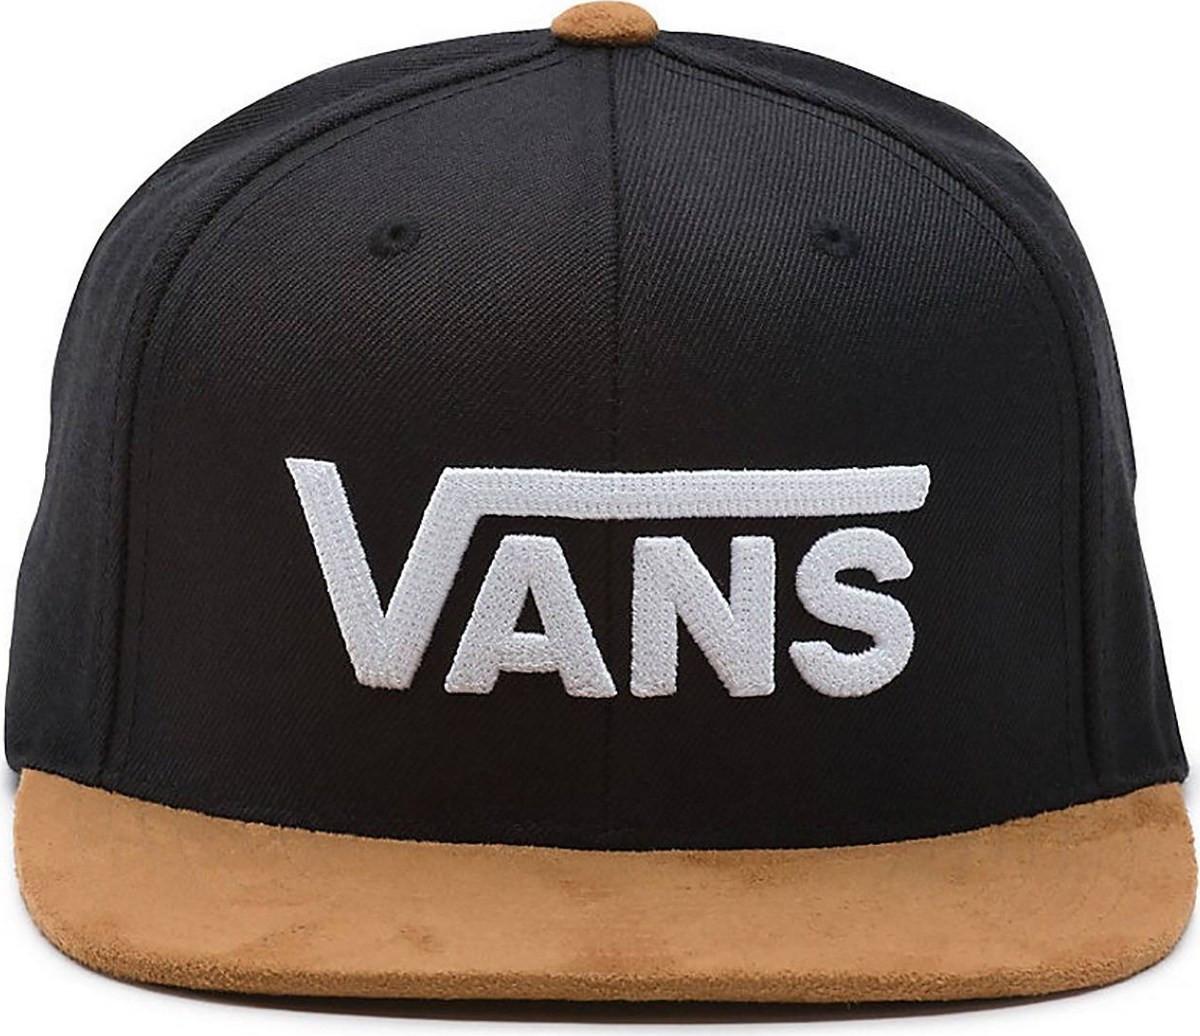 efd2c0f248 vans men - Ανδρικά Καπέλα (Σελίδα 5)